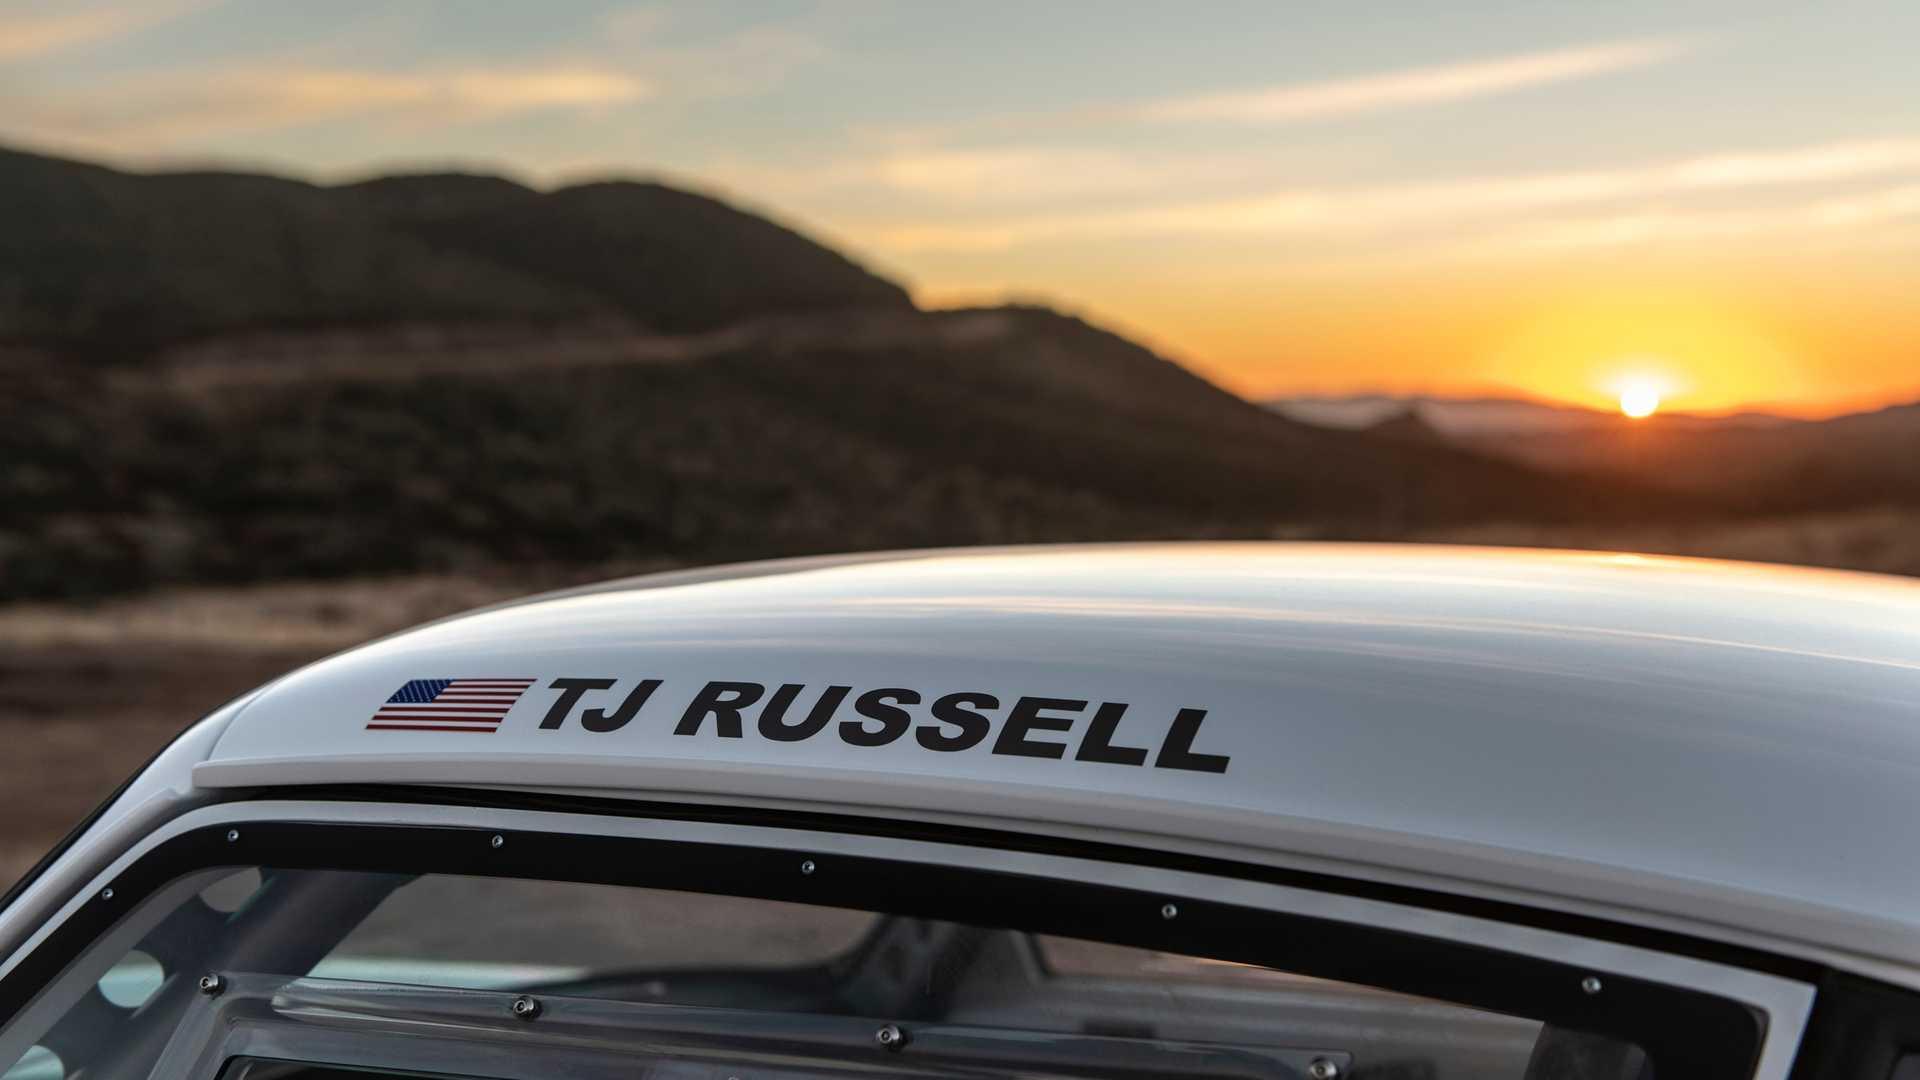 russell-built-fabrications-911-baja-2019-12-21T223321.405